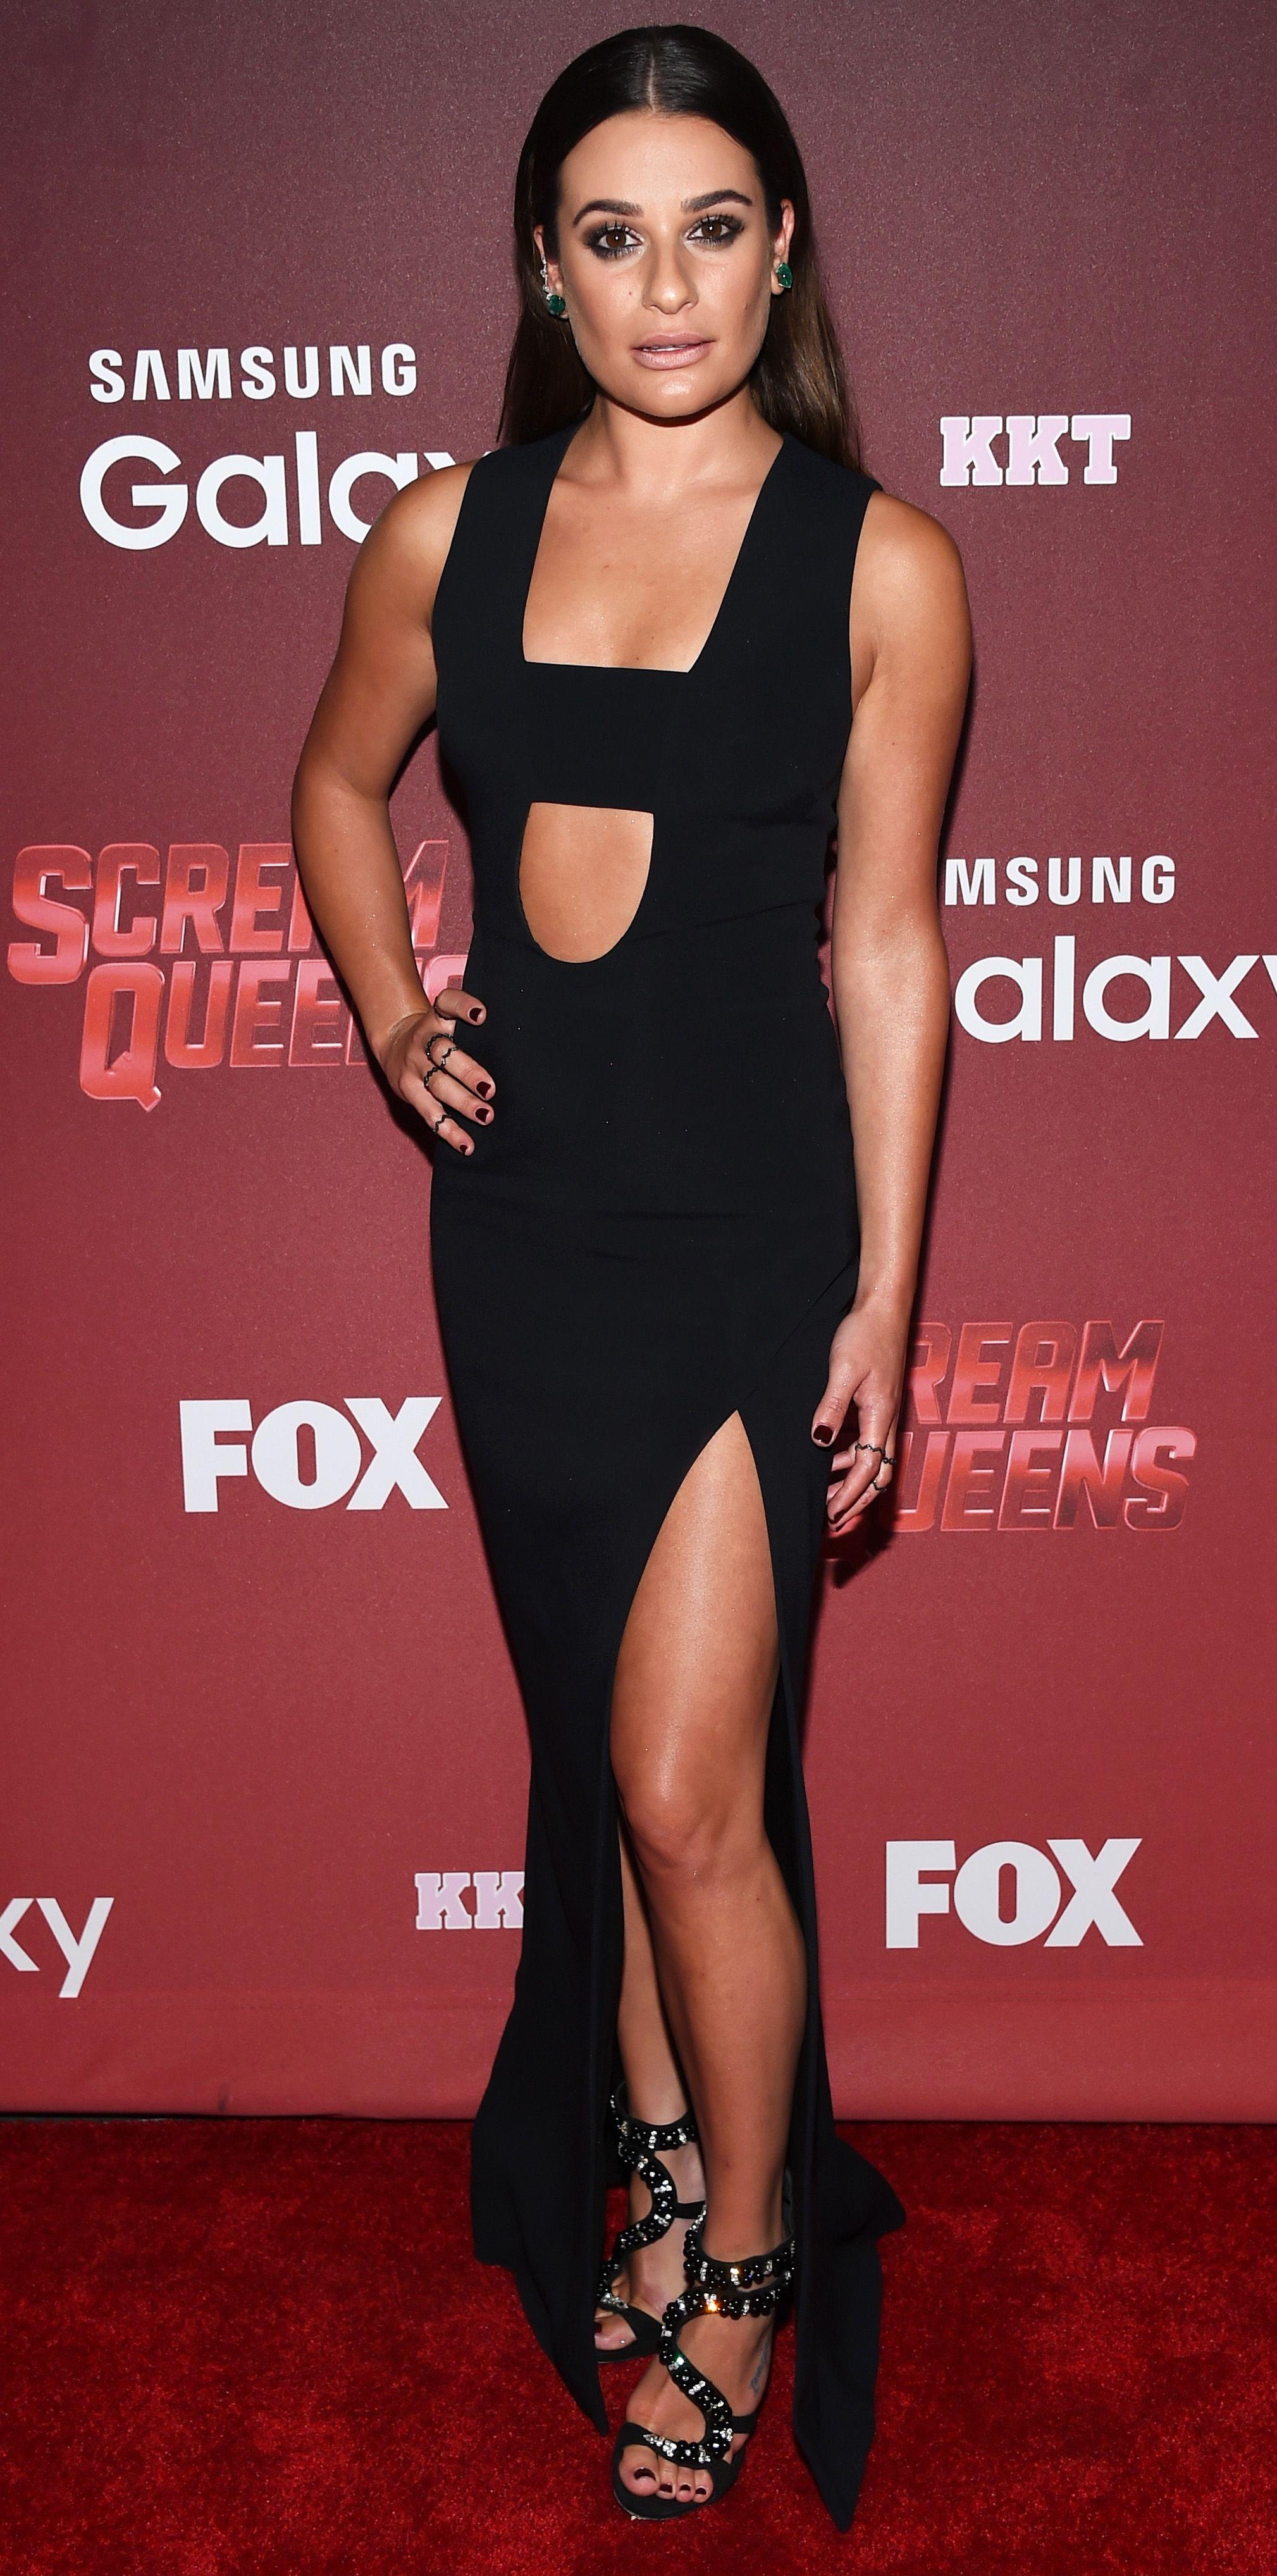 Celebrites Lea Michele Celebrites nudes (69 photo), Topless, Sideboobs, Selfie, see through 2019